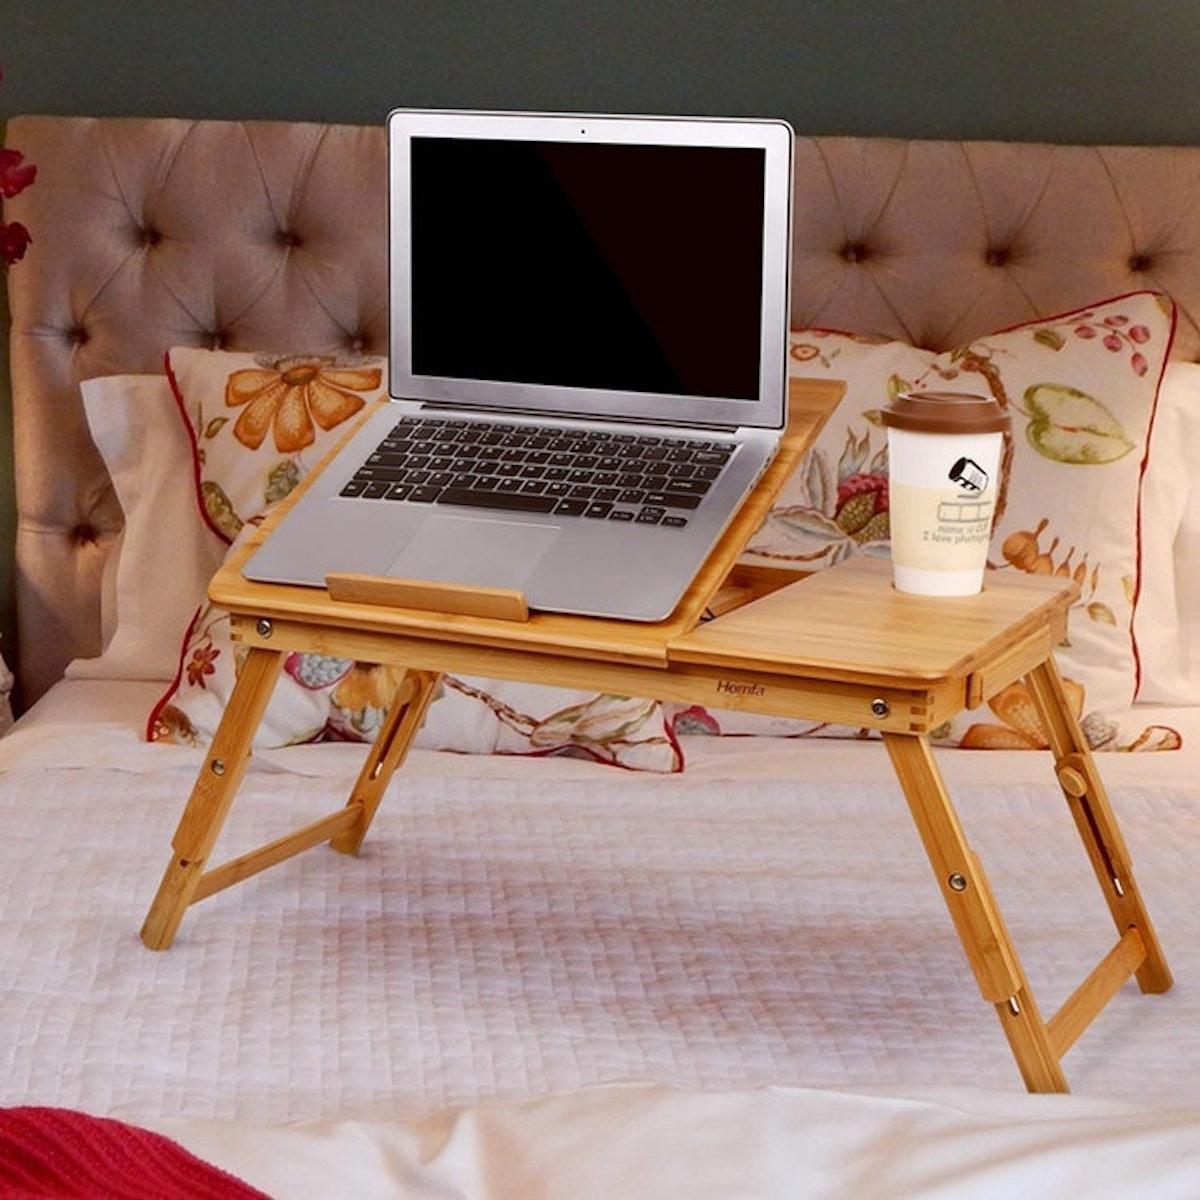 Homfa Laptop Desk